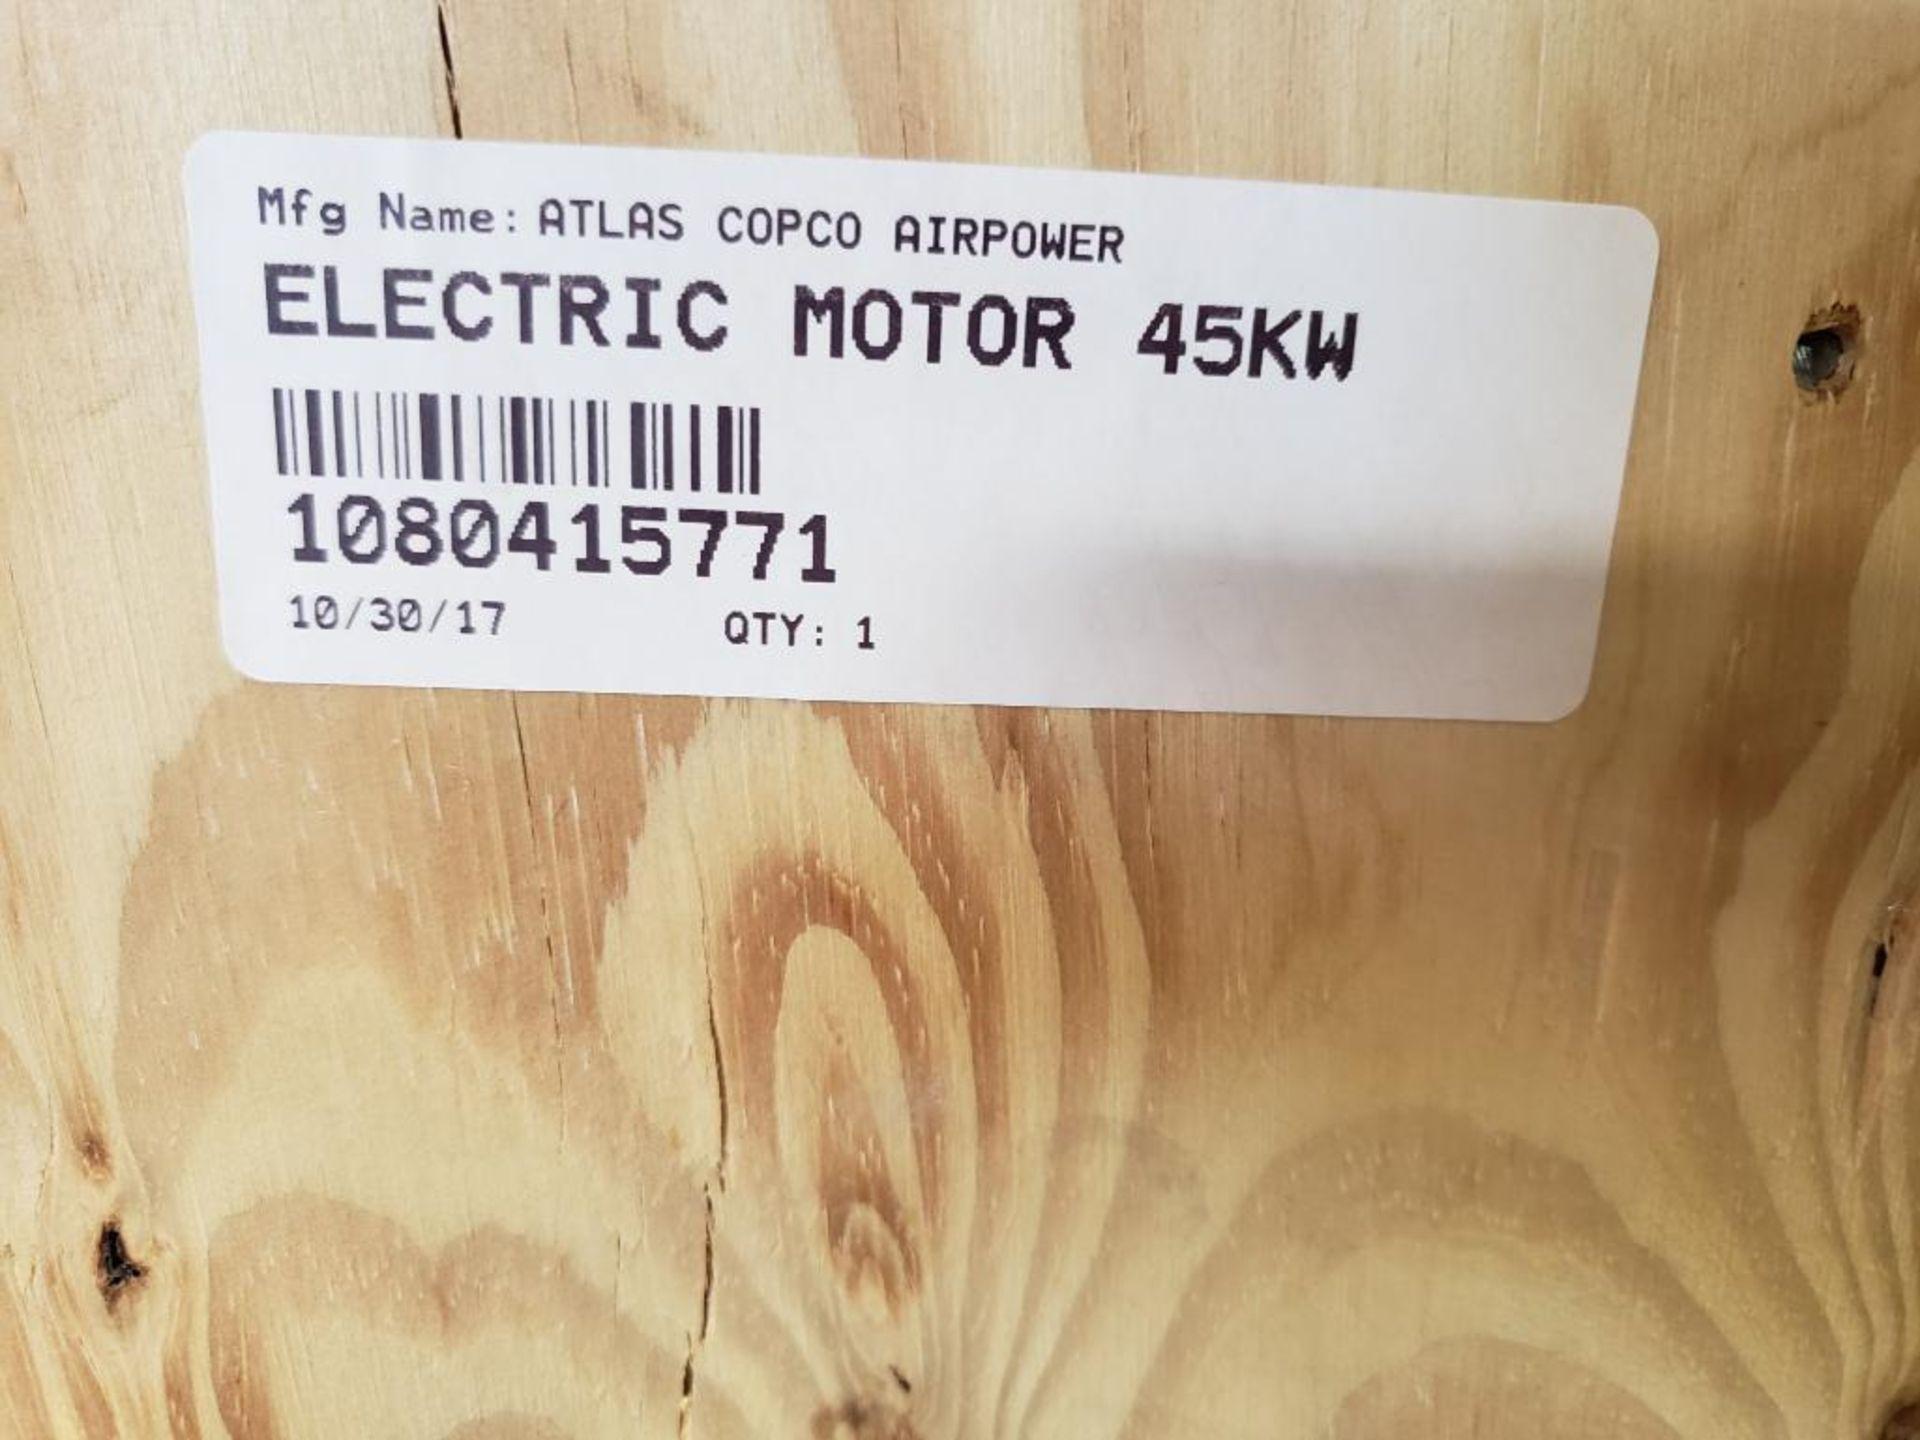 45kW Siemens 3PH motor. 1LA92092AA91-ZT56. 200V, 2965RPM. - Image 8 of 9